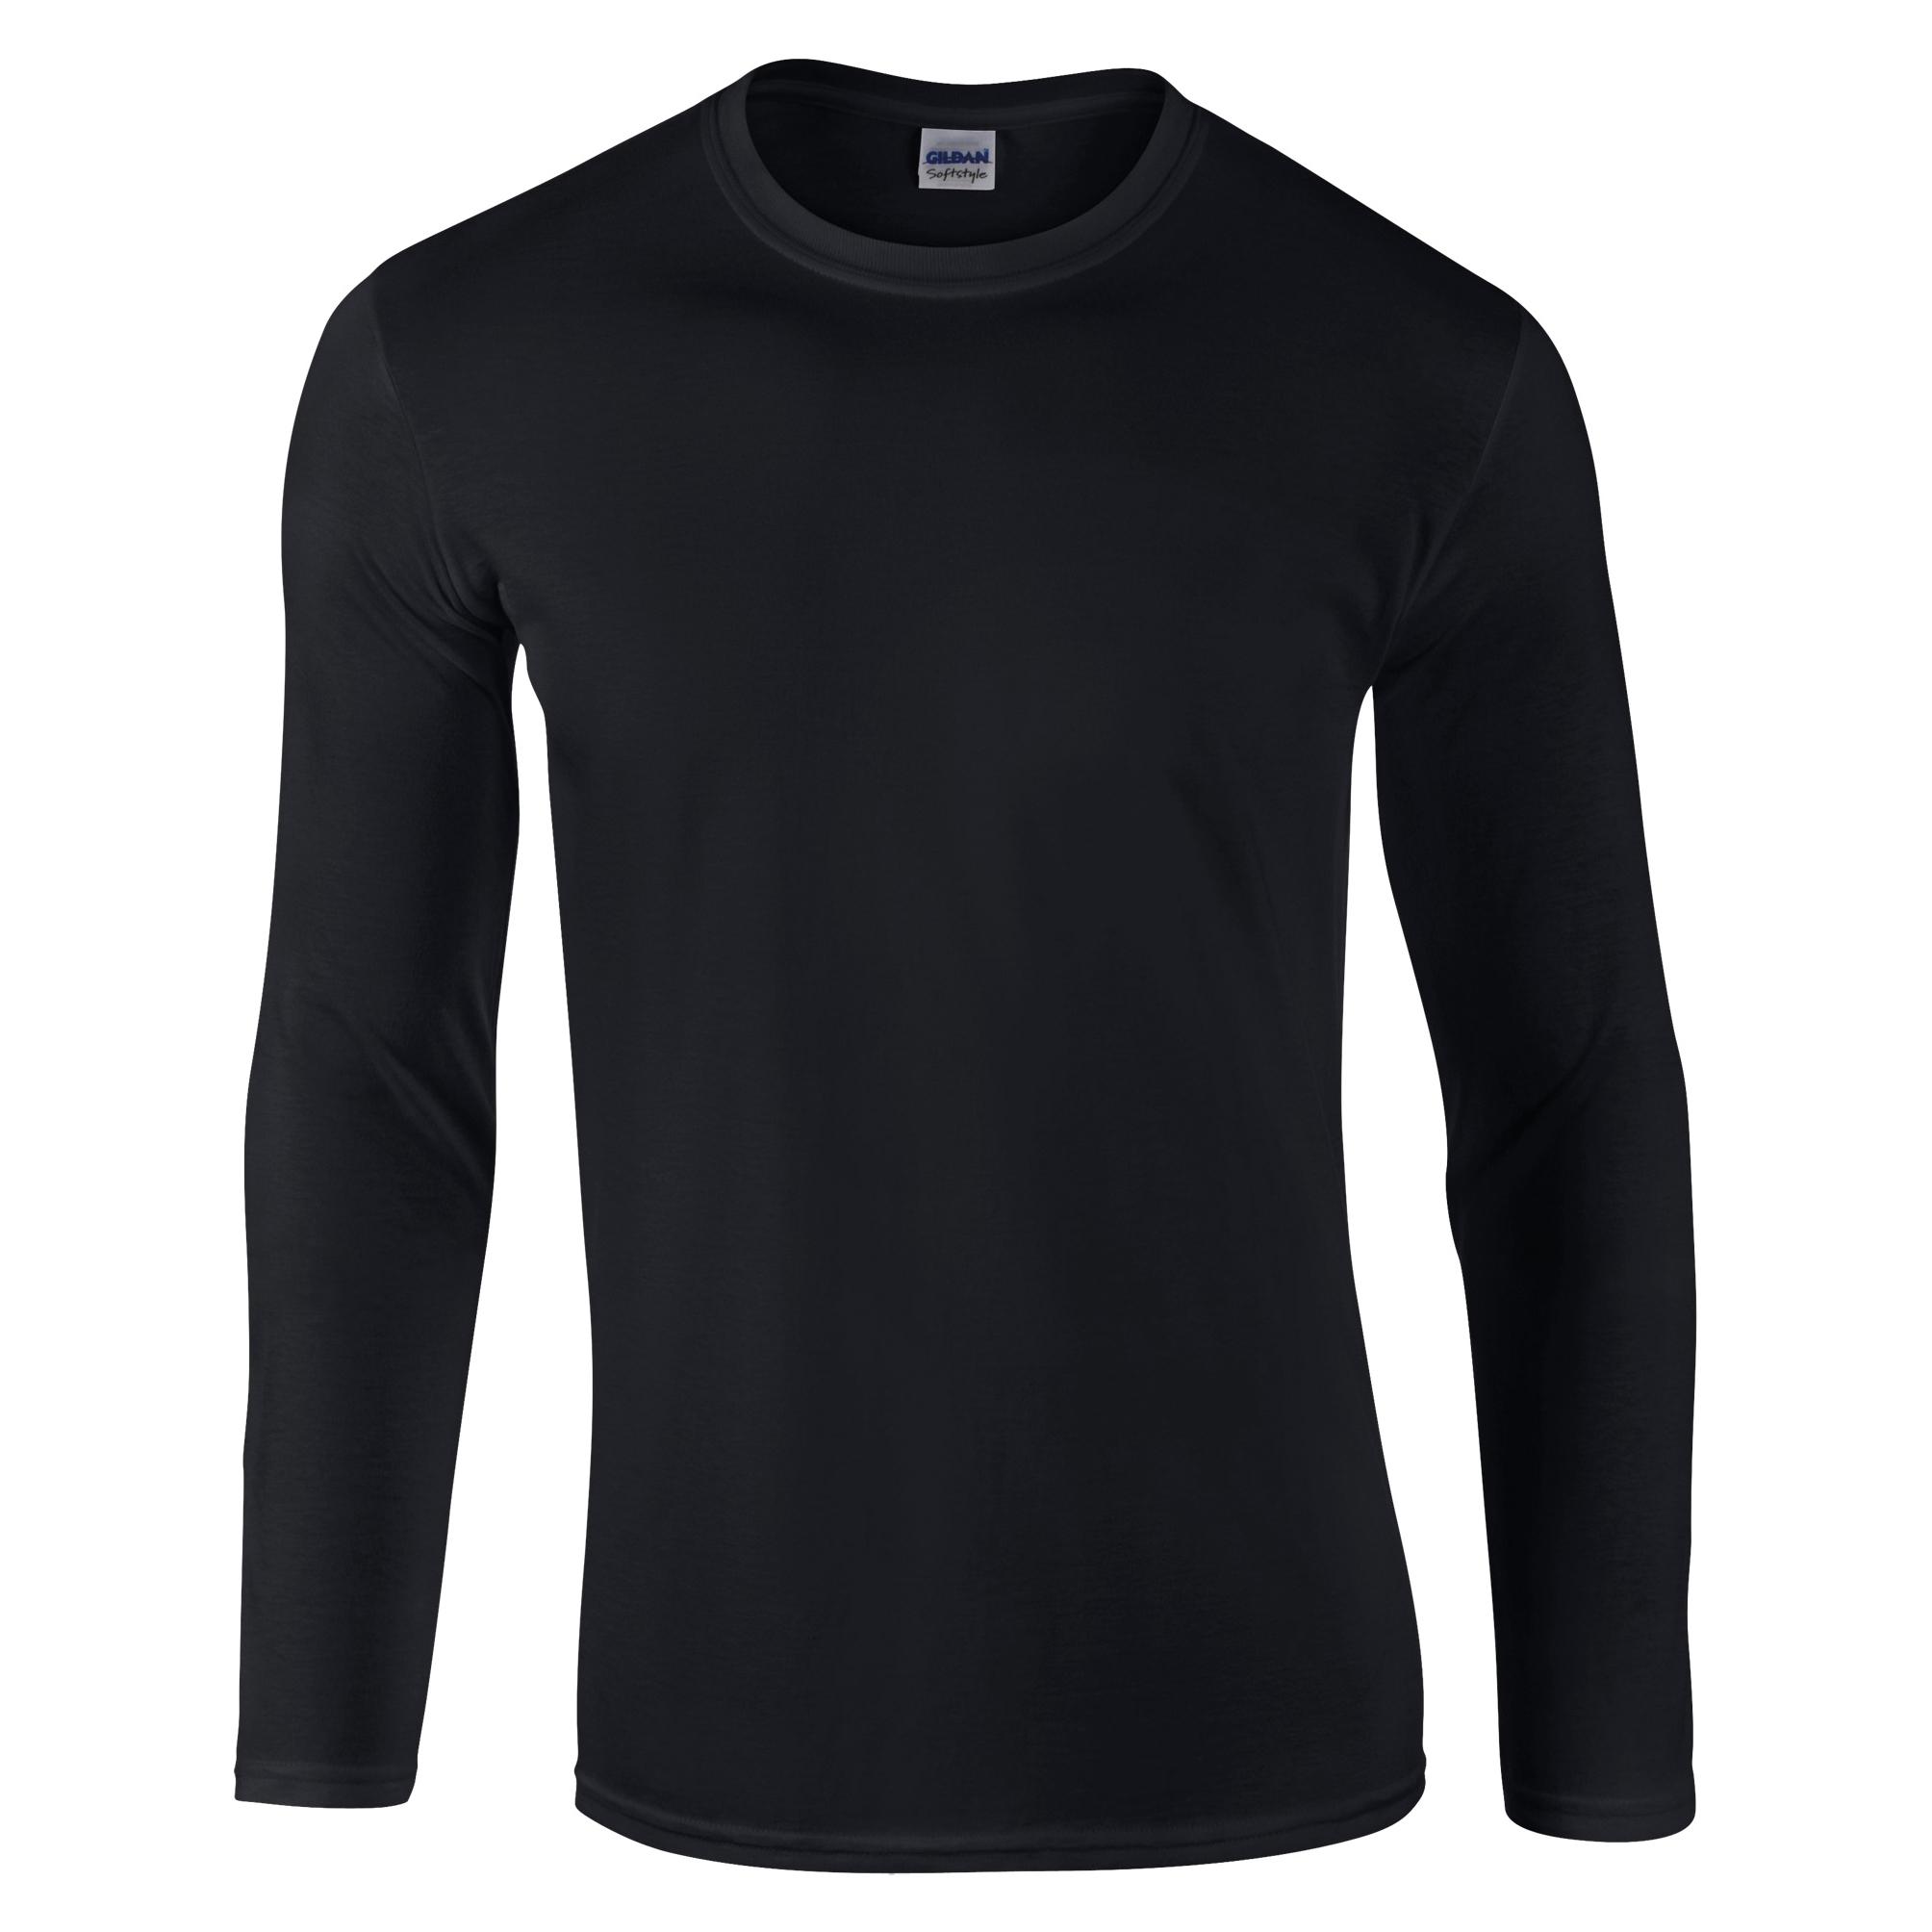 Gildan men 39 s soft style long sleeve plain t shirt 64400 for Gildan t shirt styles